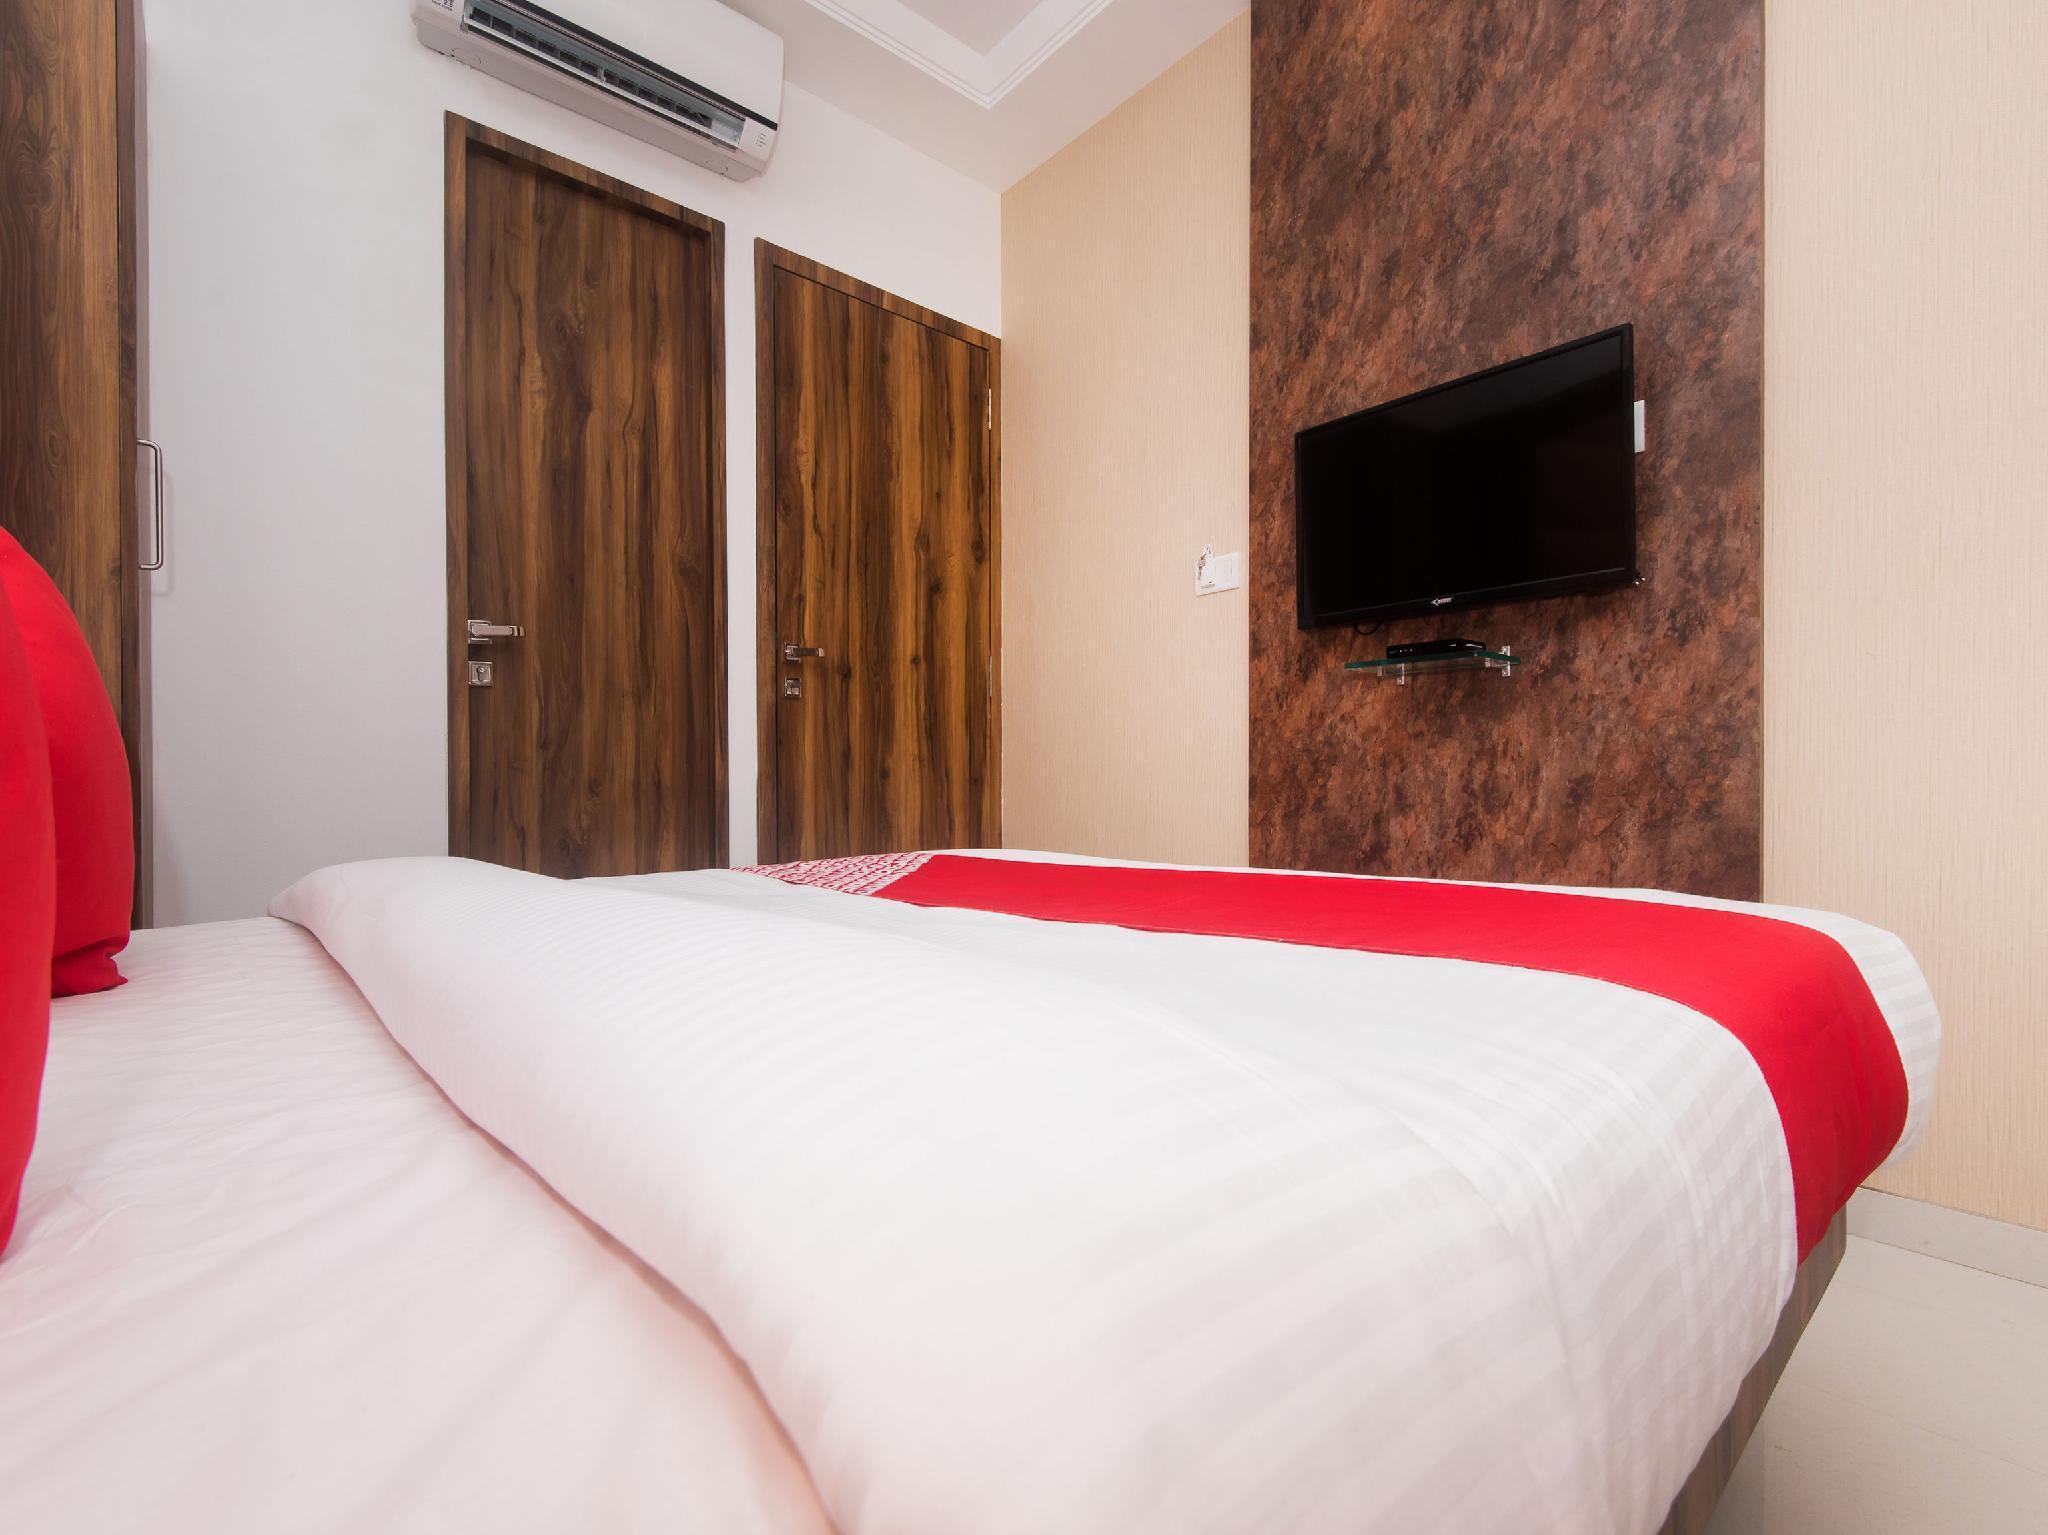 OYO 15519 Hotel Grand Residency